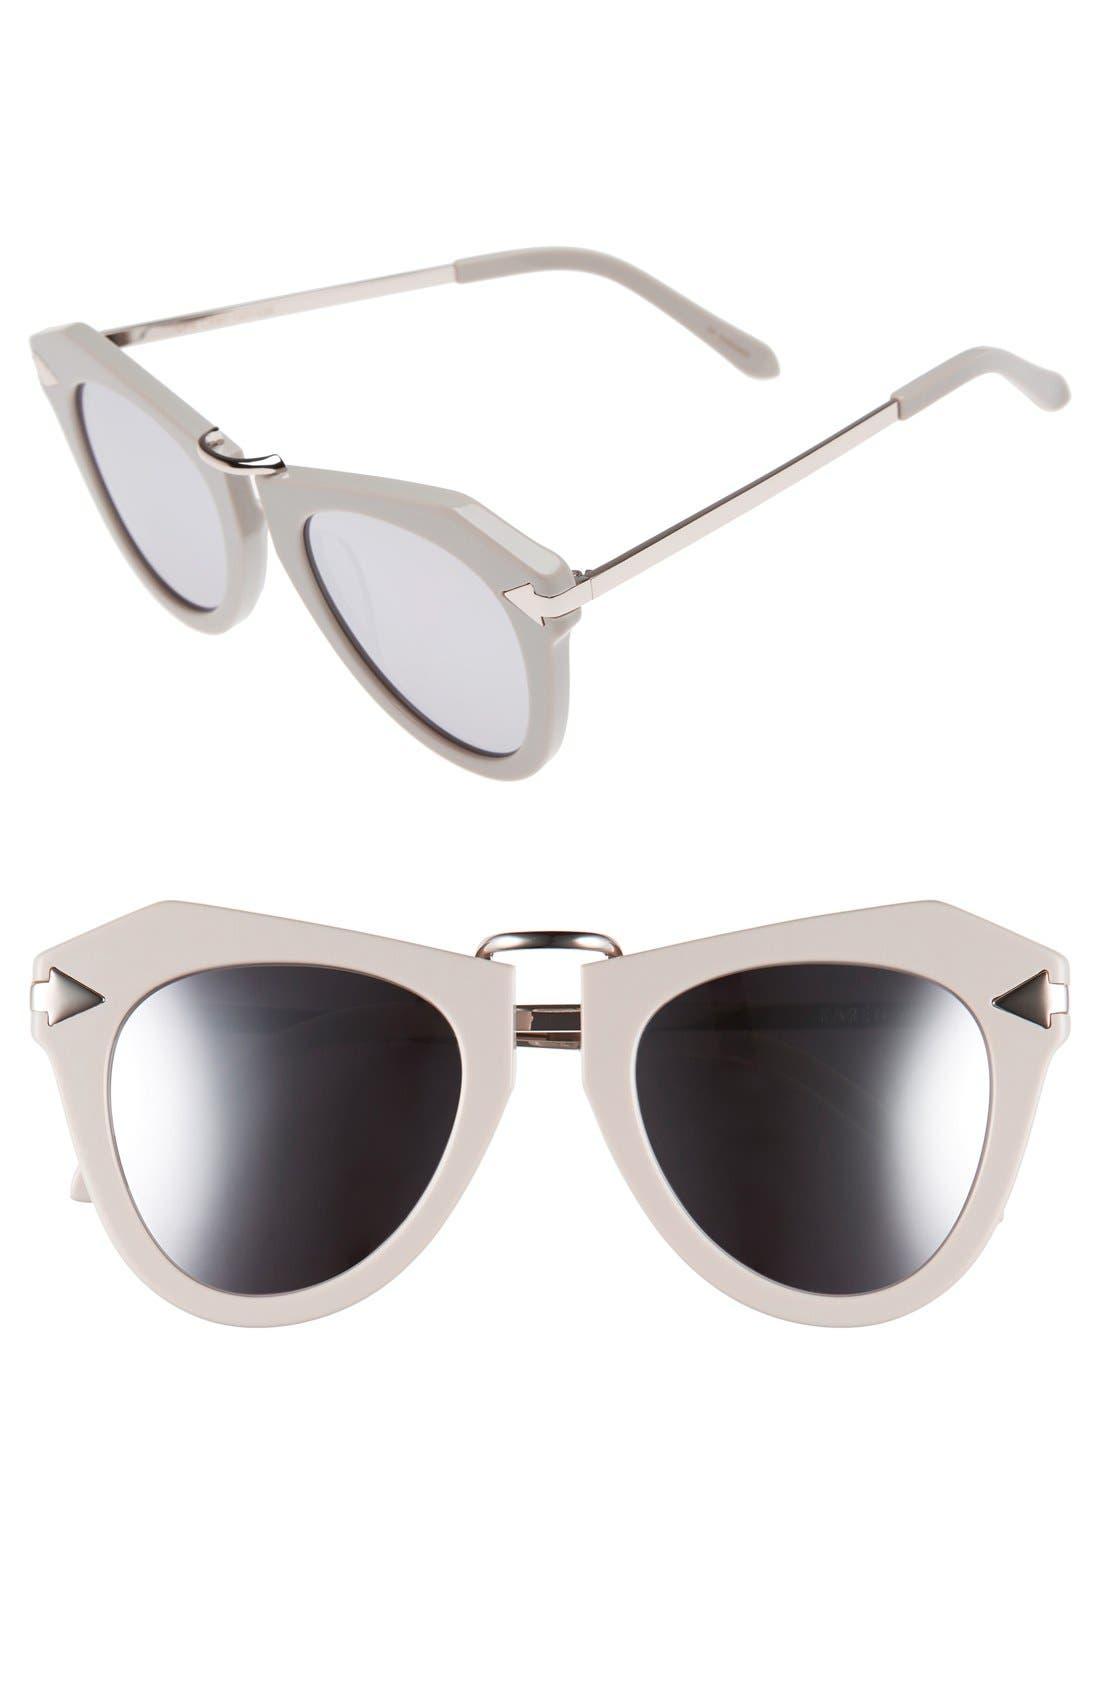 Alternate Image 1 Selected - Karen Walker 'One Orbit - Arrowed by Karen' 51mm Sunglasses